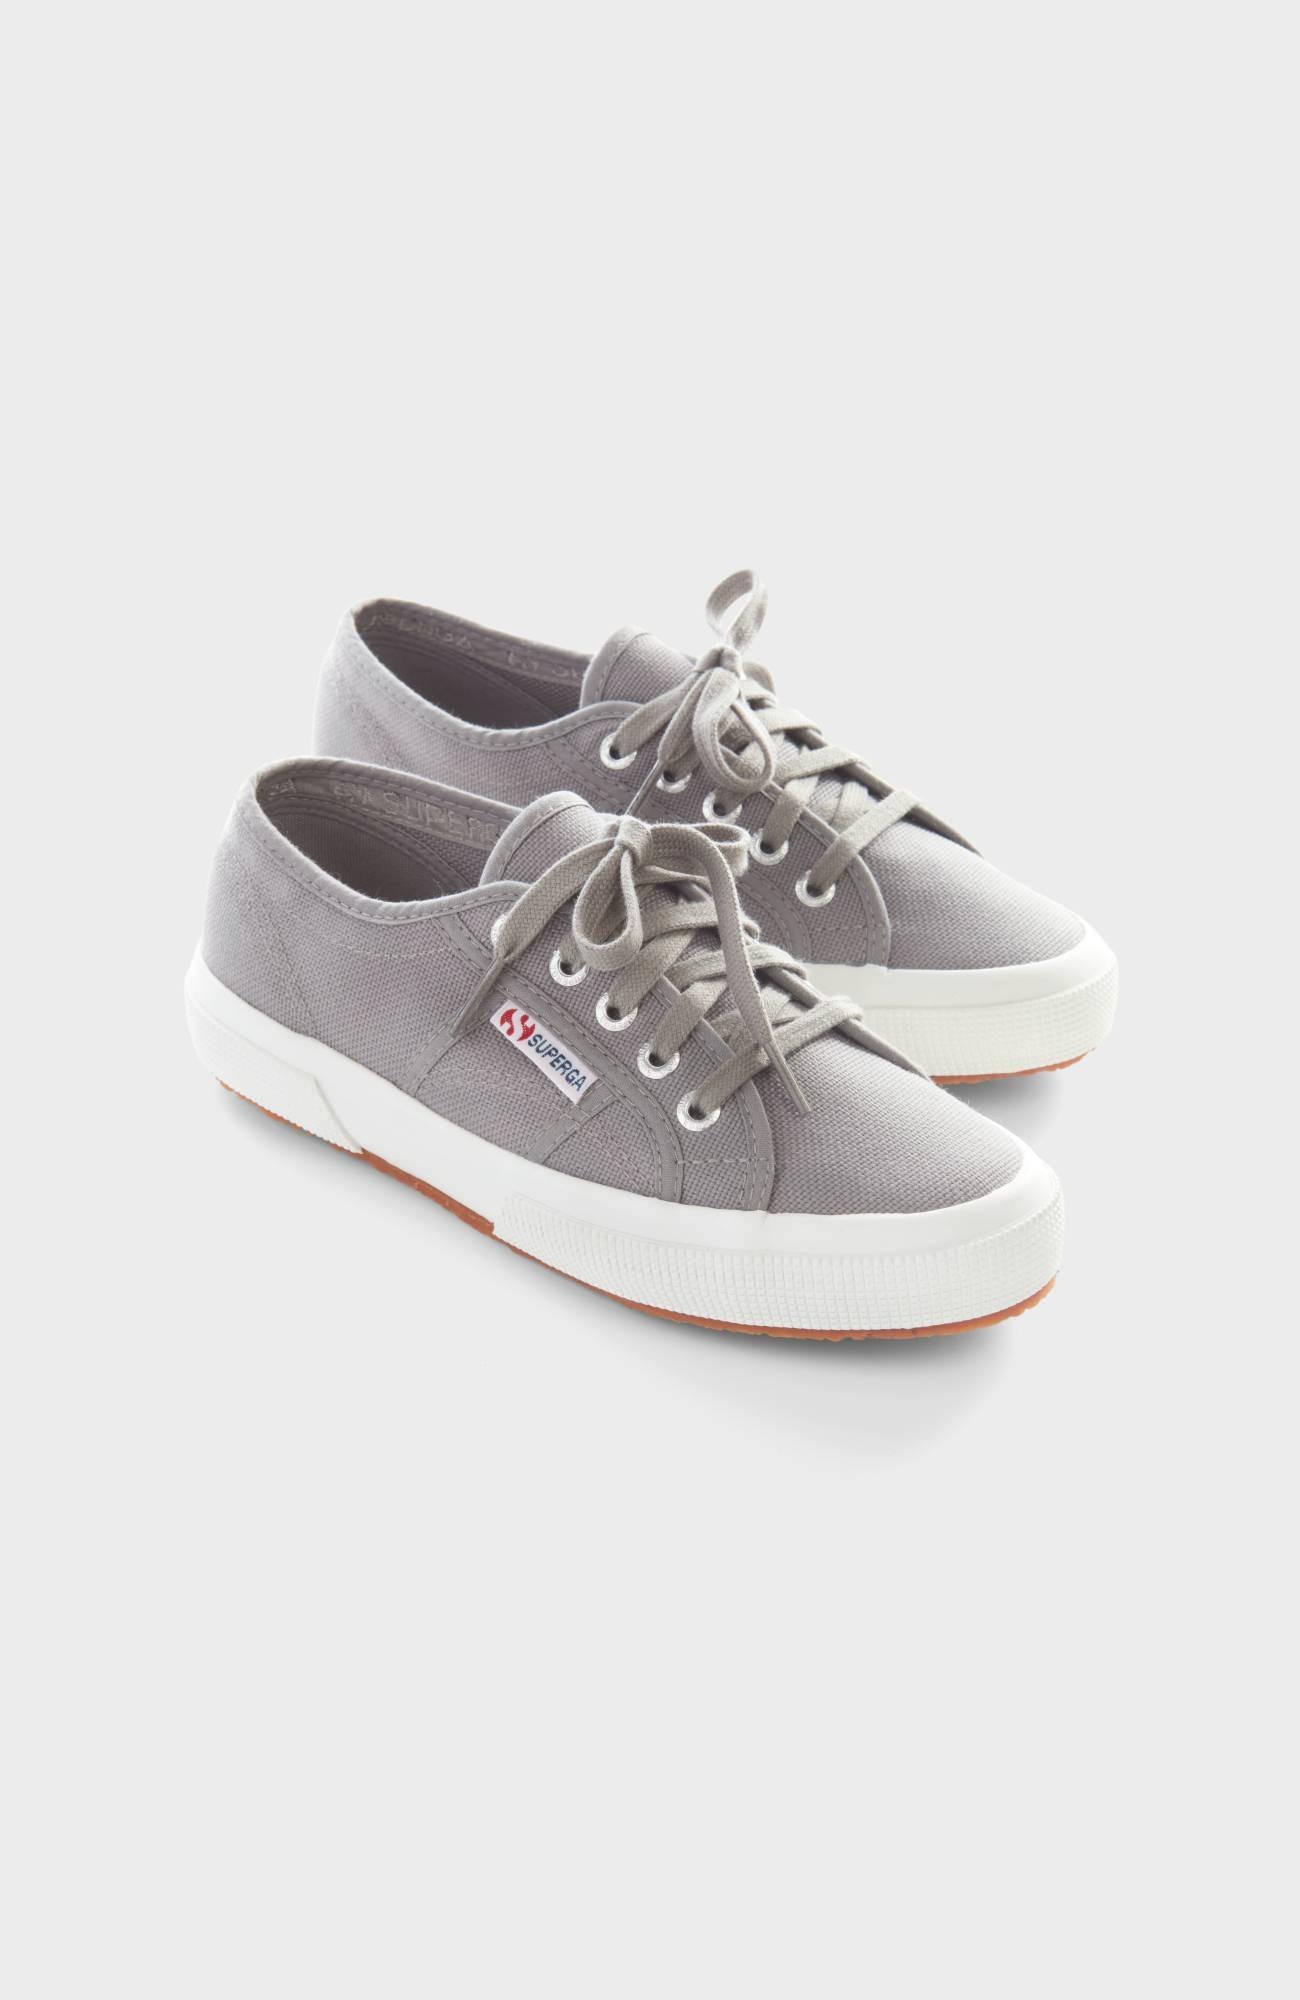 Superga® Classic Sneakers   JJill